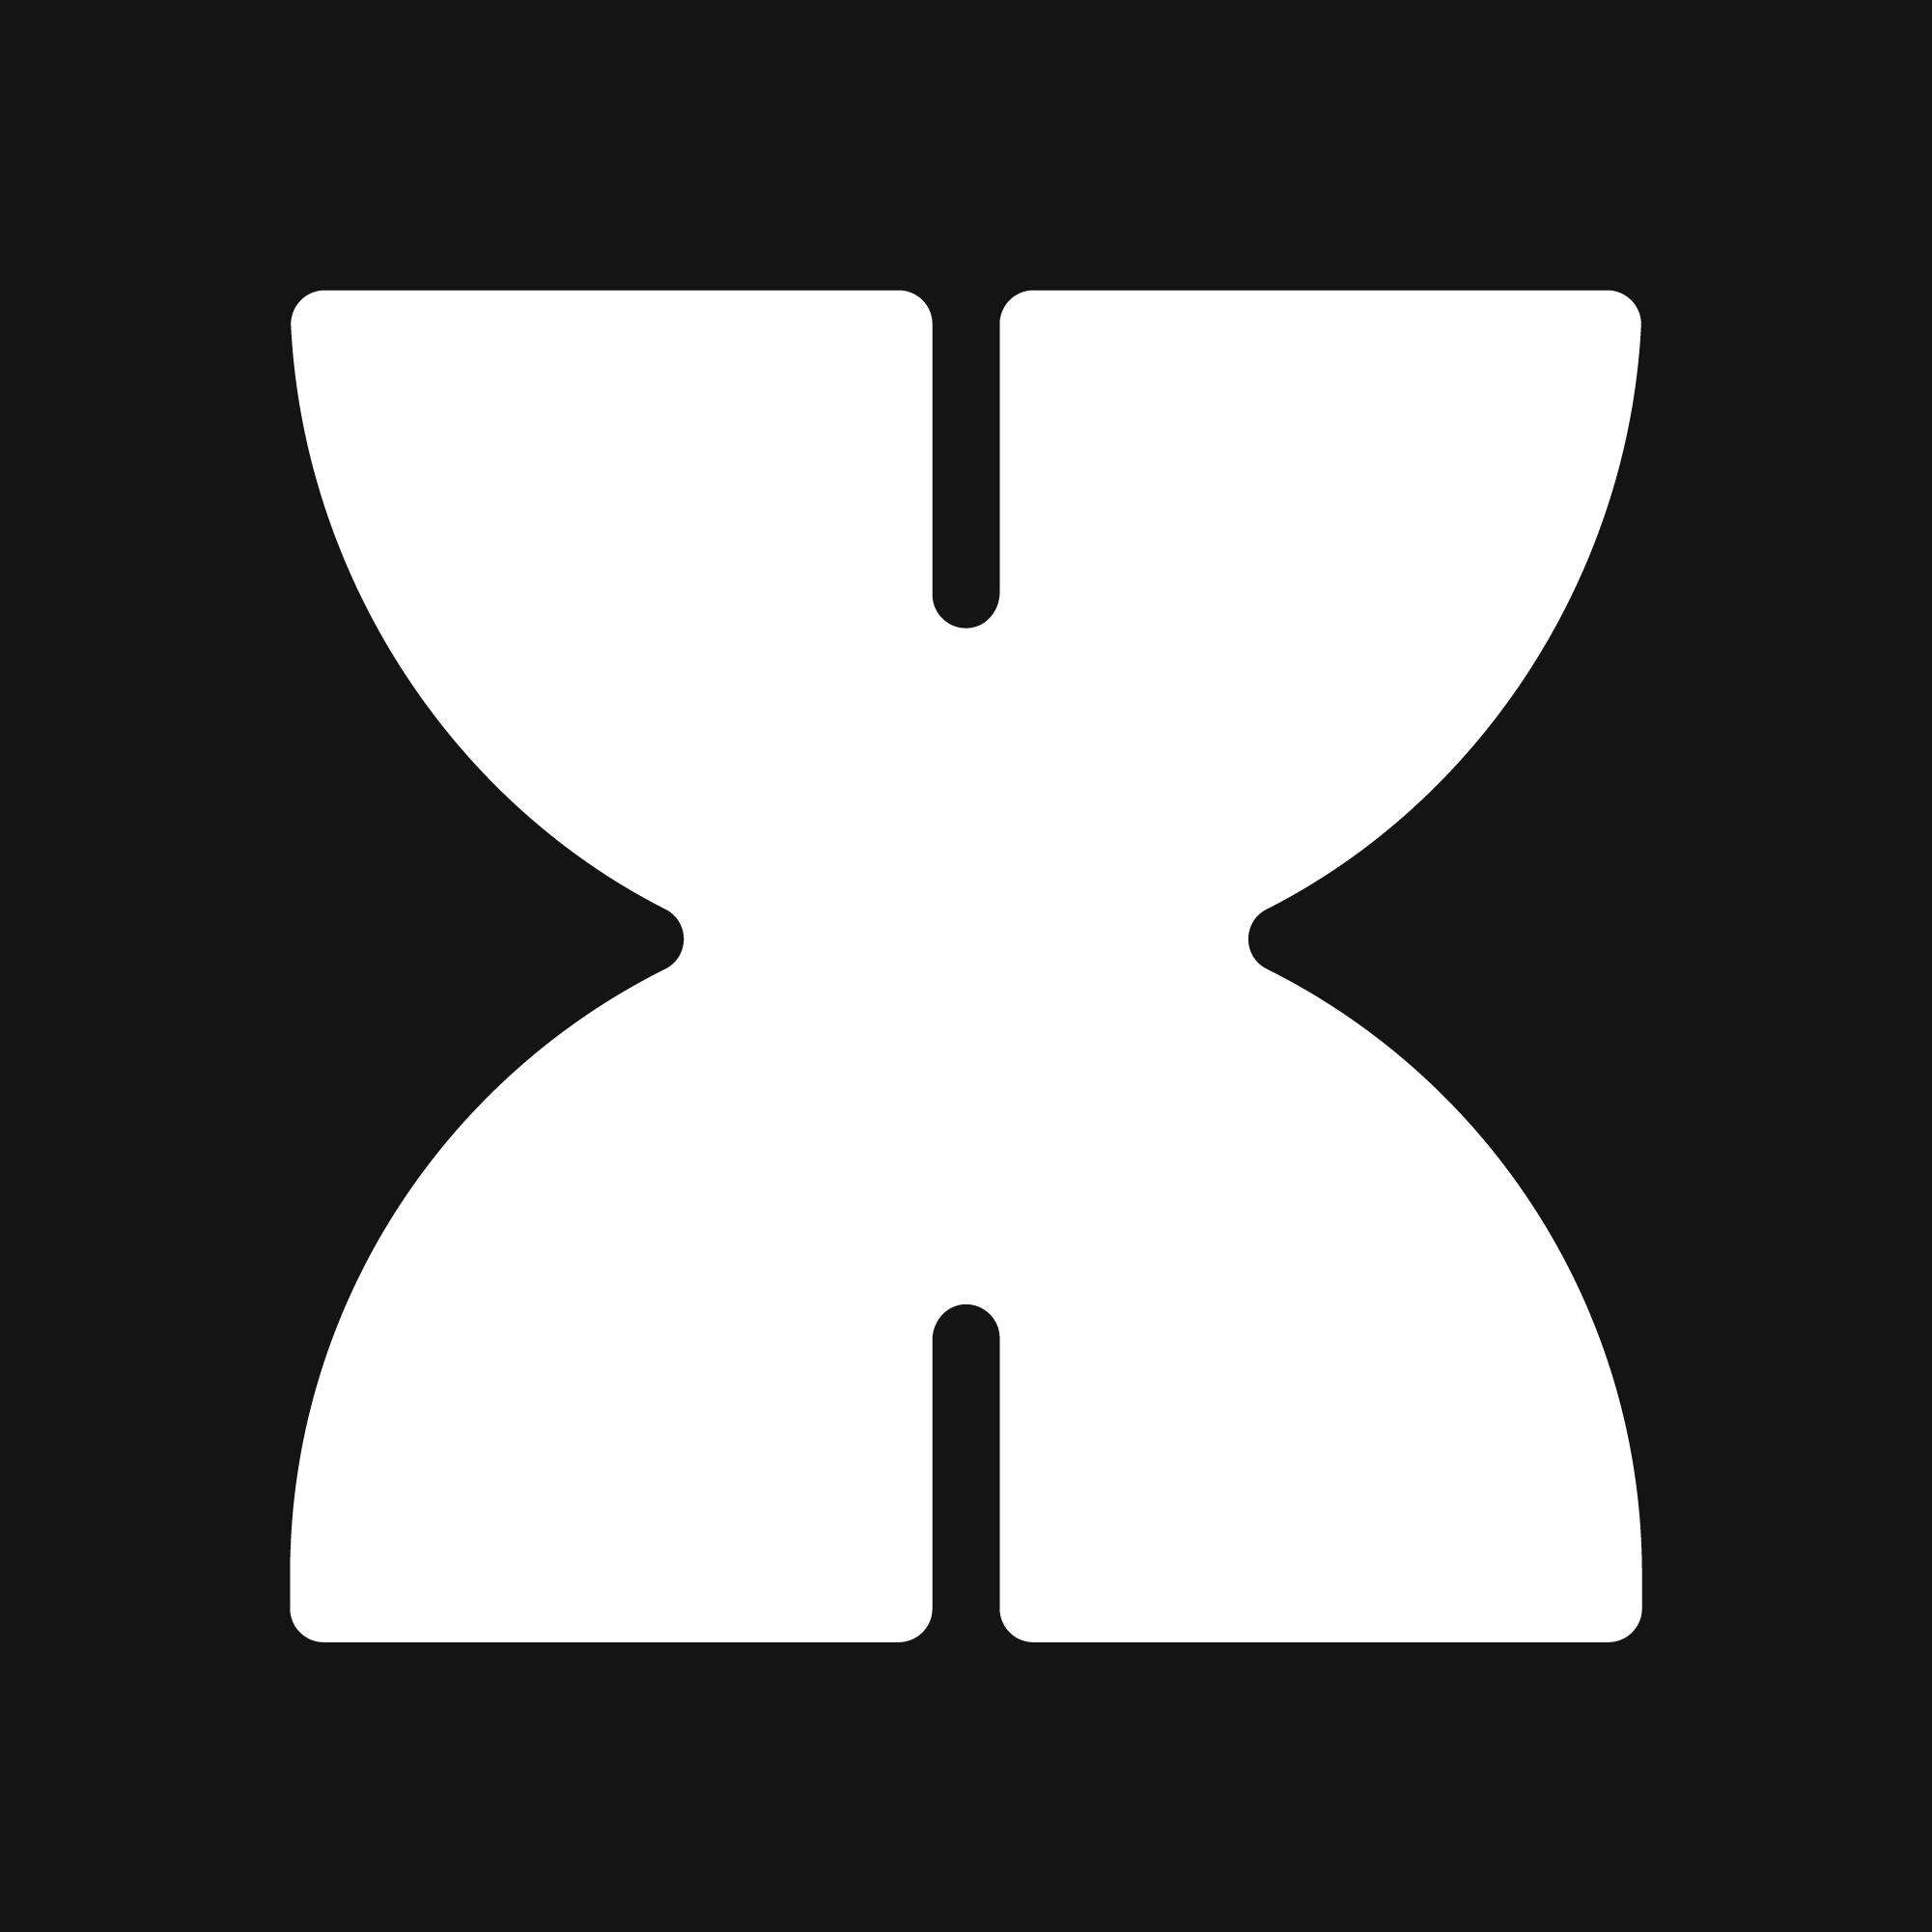 BW__Letter_X